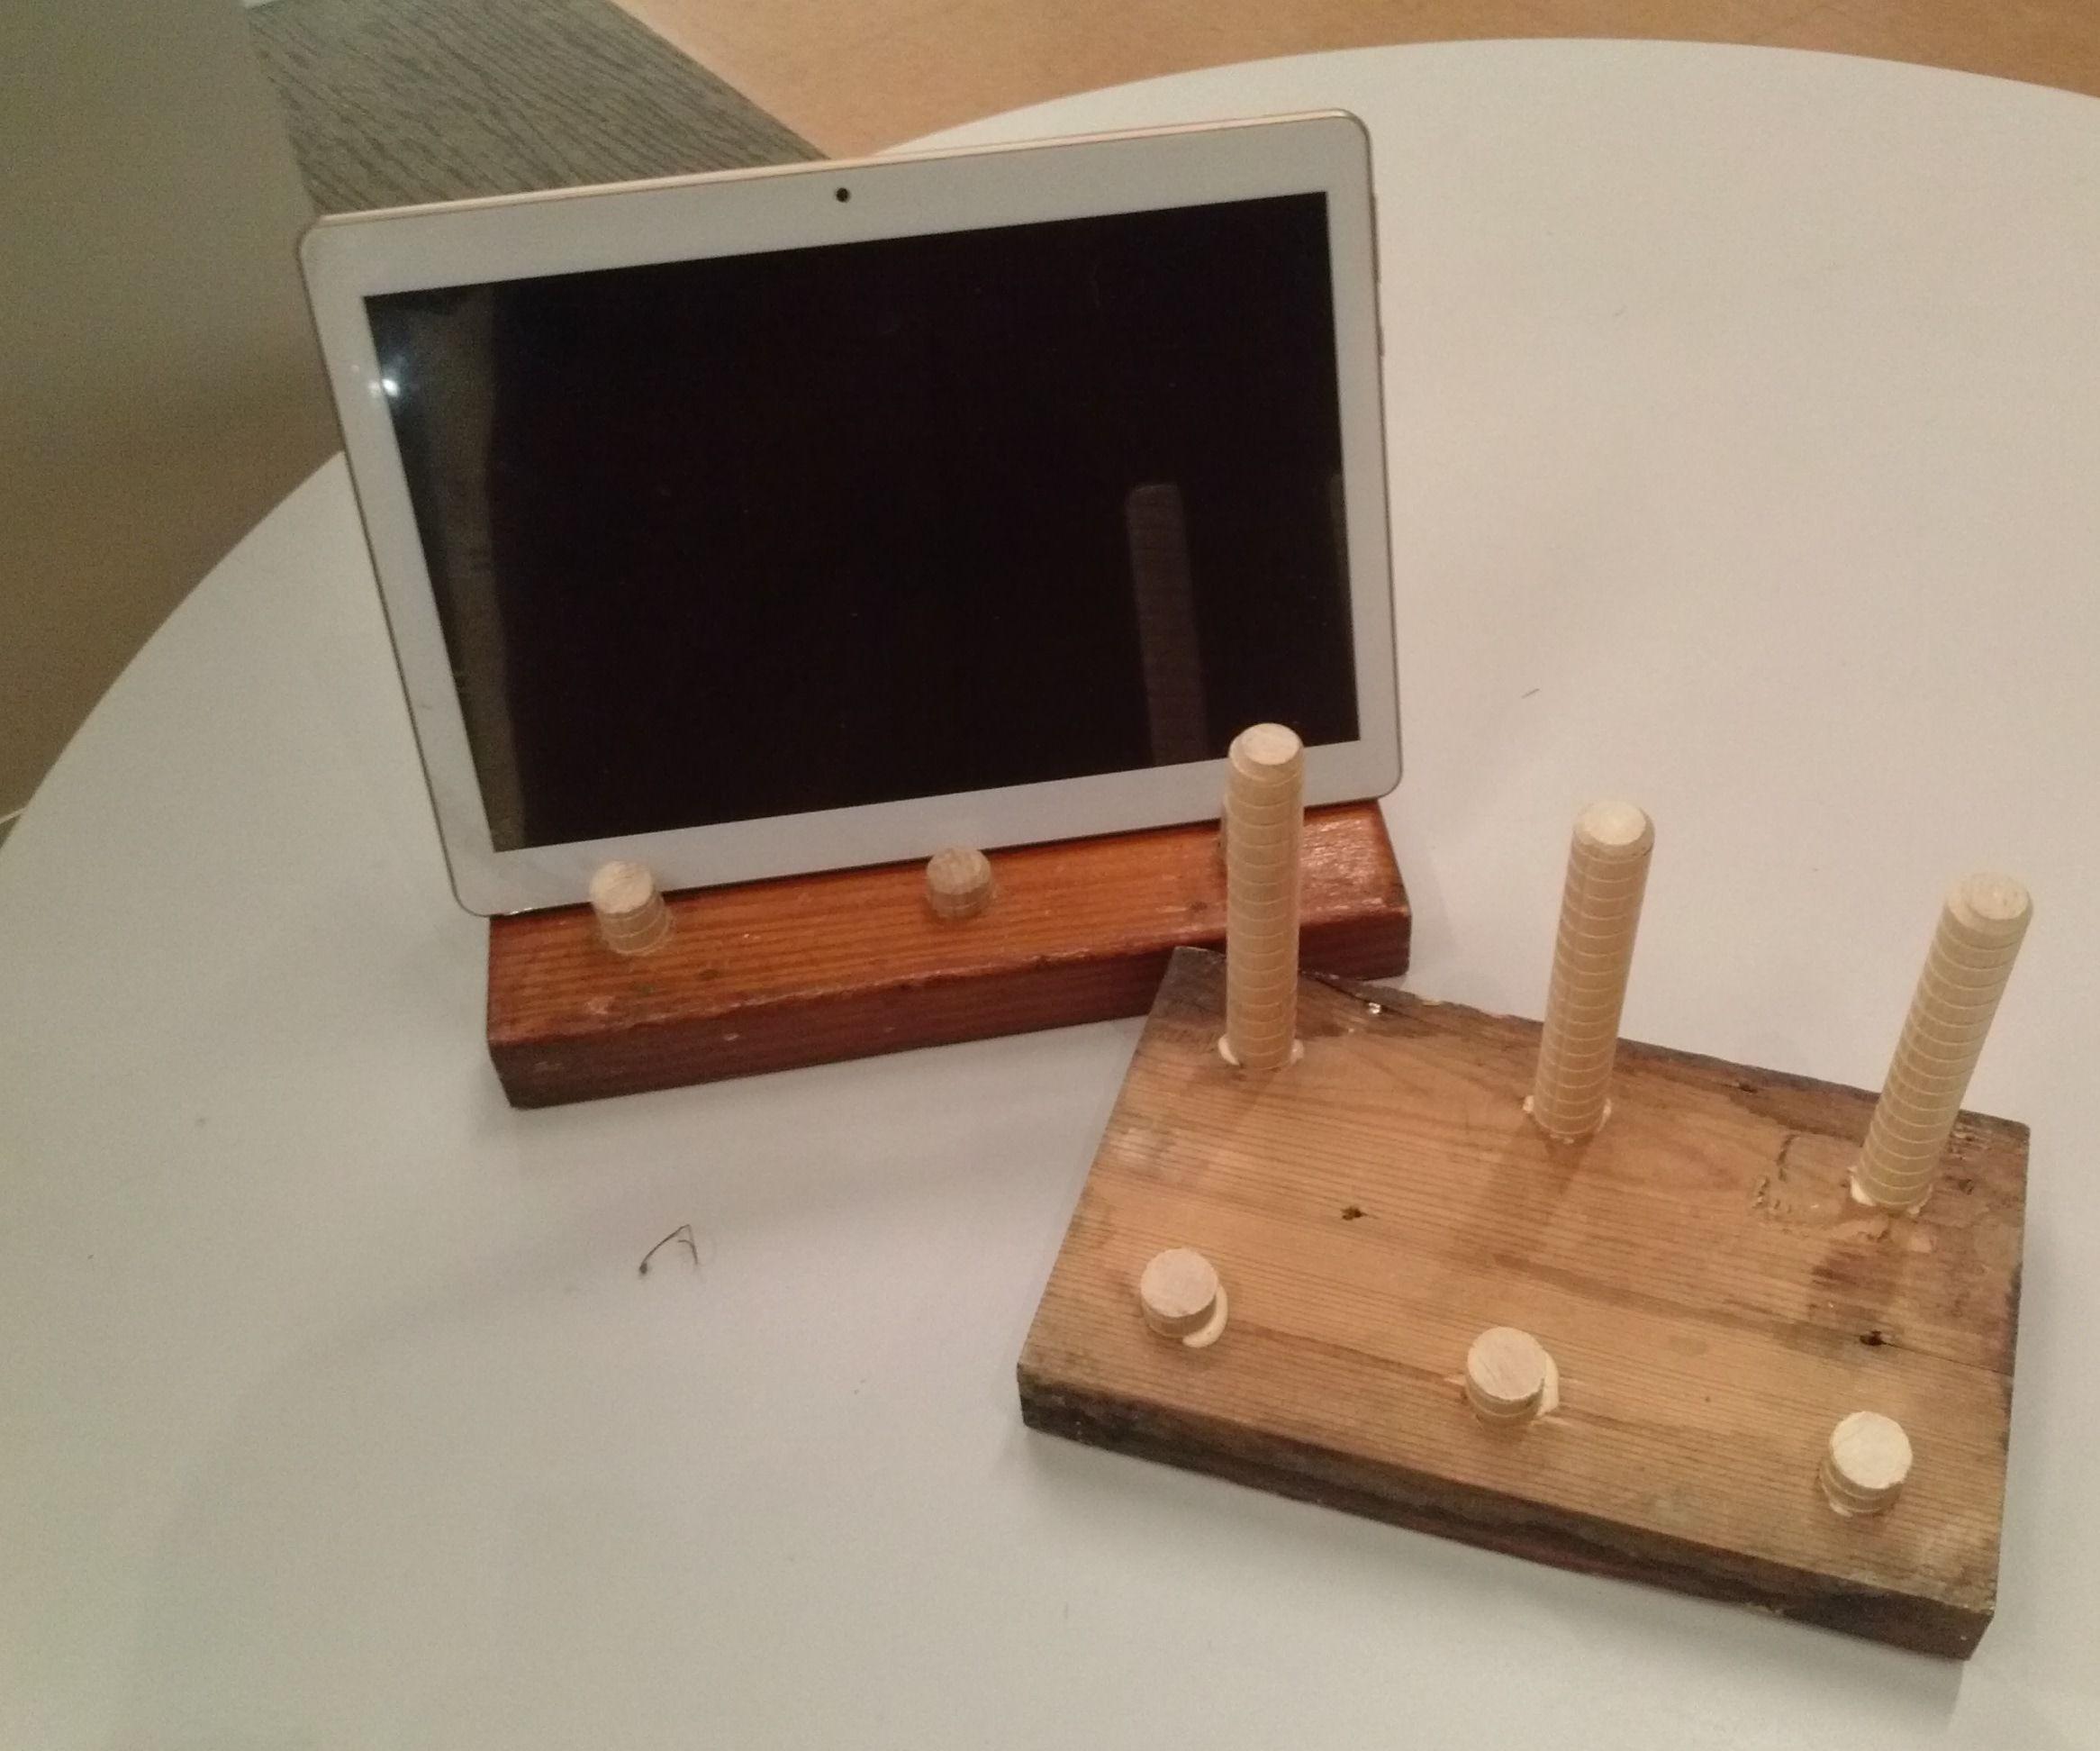 Dowel Peg Tablet Stand